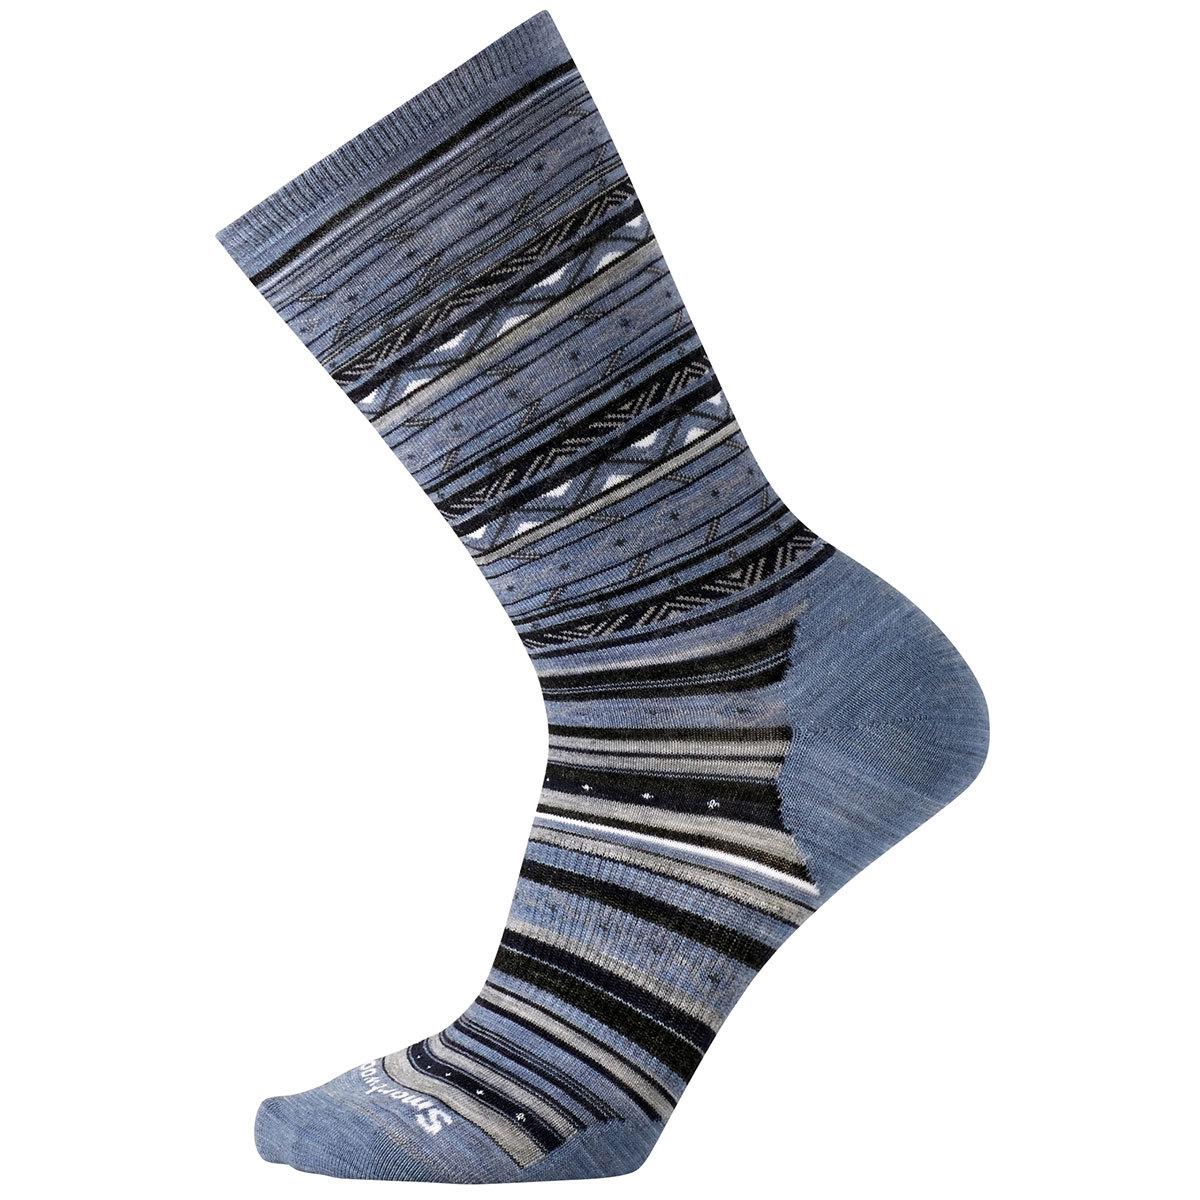 Smartwool Women's Ethno Graphic Crew Socks - Blue, S